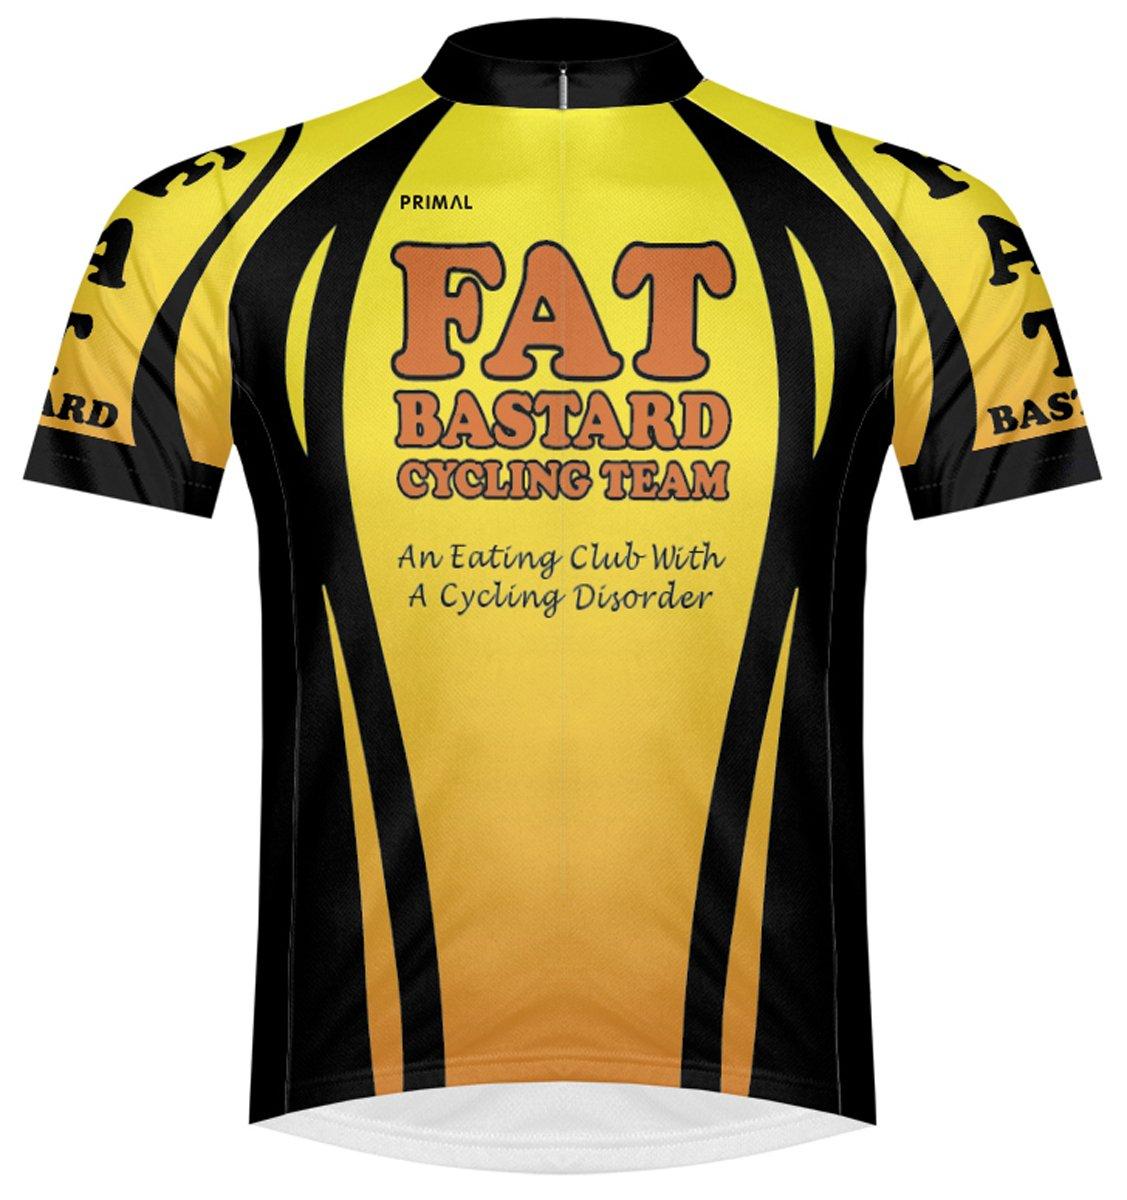 Primal Wear Fat BastardサイクリングチームイエローオレンジブラックCycling Jerseyメンズ半袖 B019HFPHK6 Medium